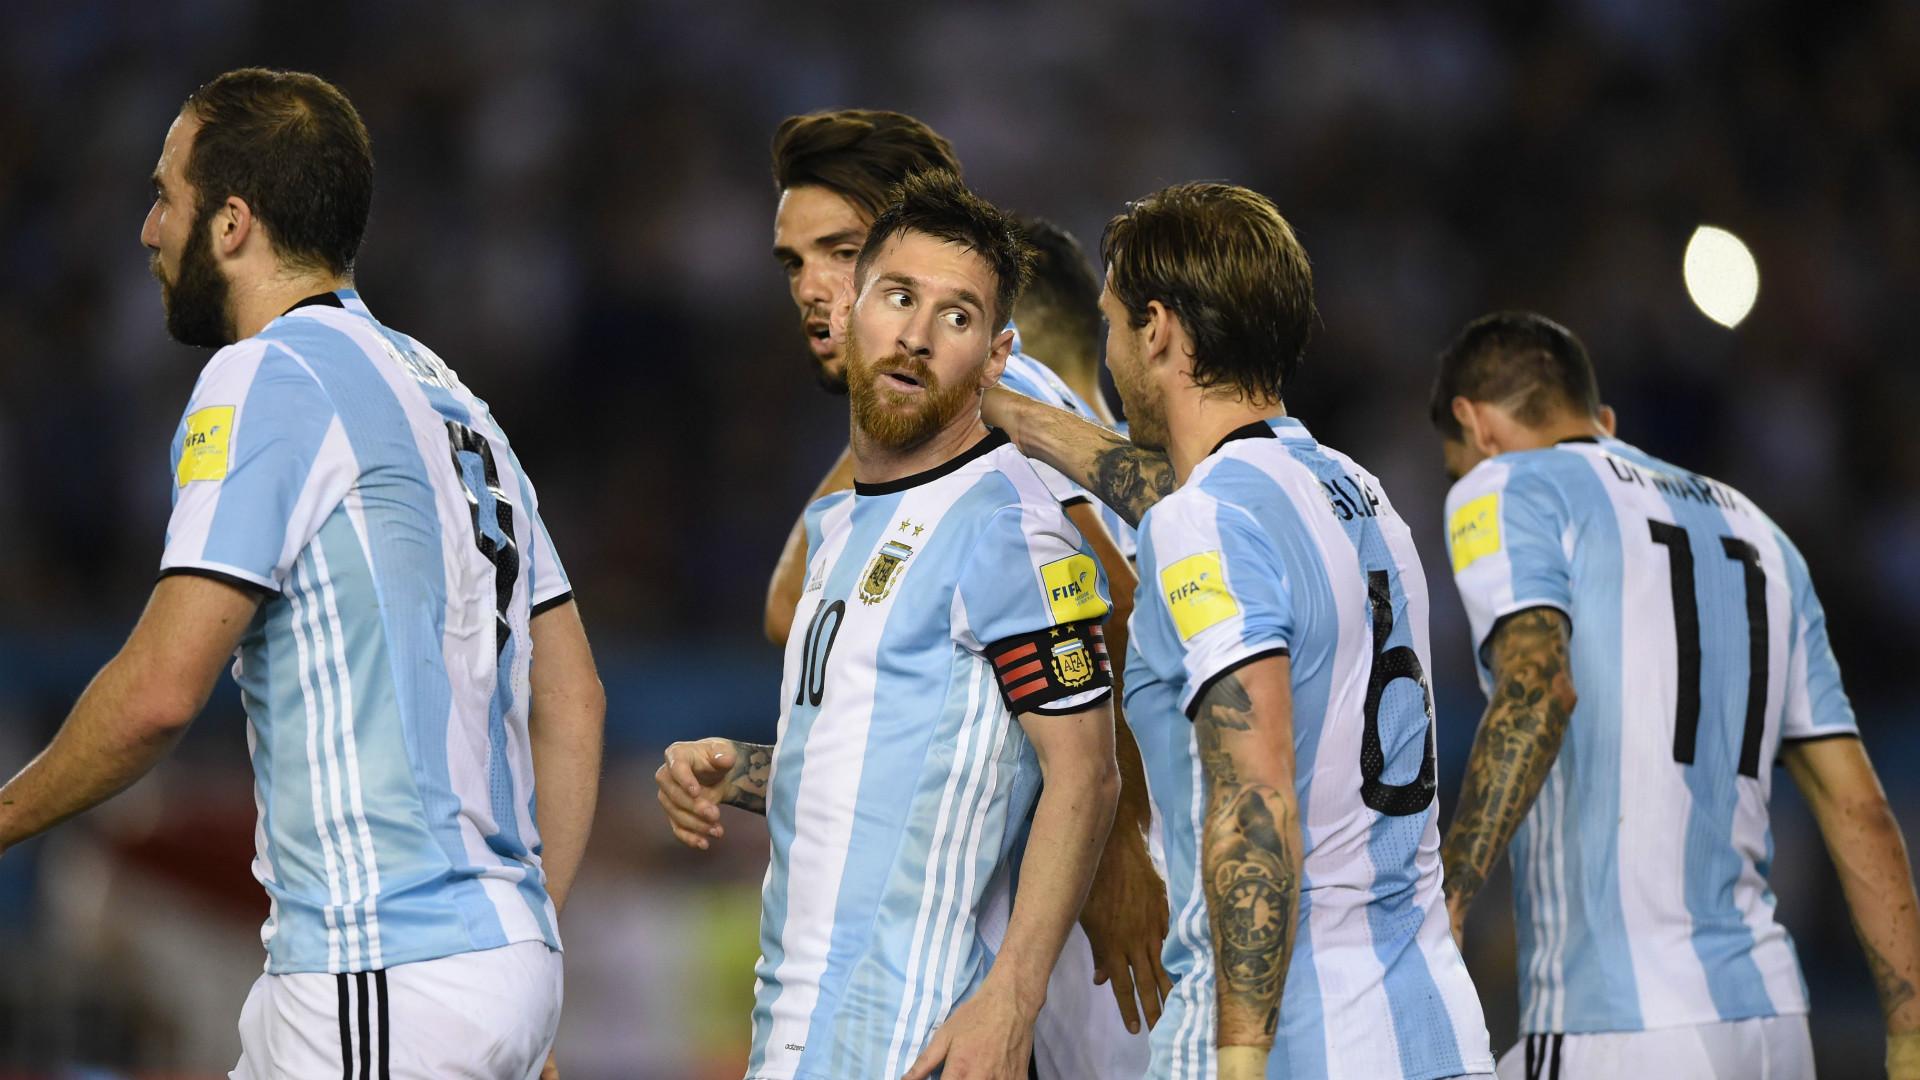 Fall Wallpaper For Desktop Free Messi Argentina Wallpapers Background Hd Pixelstalk Net